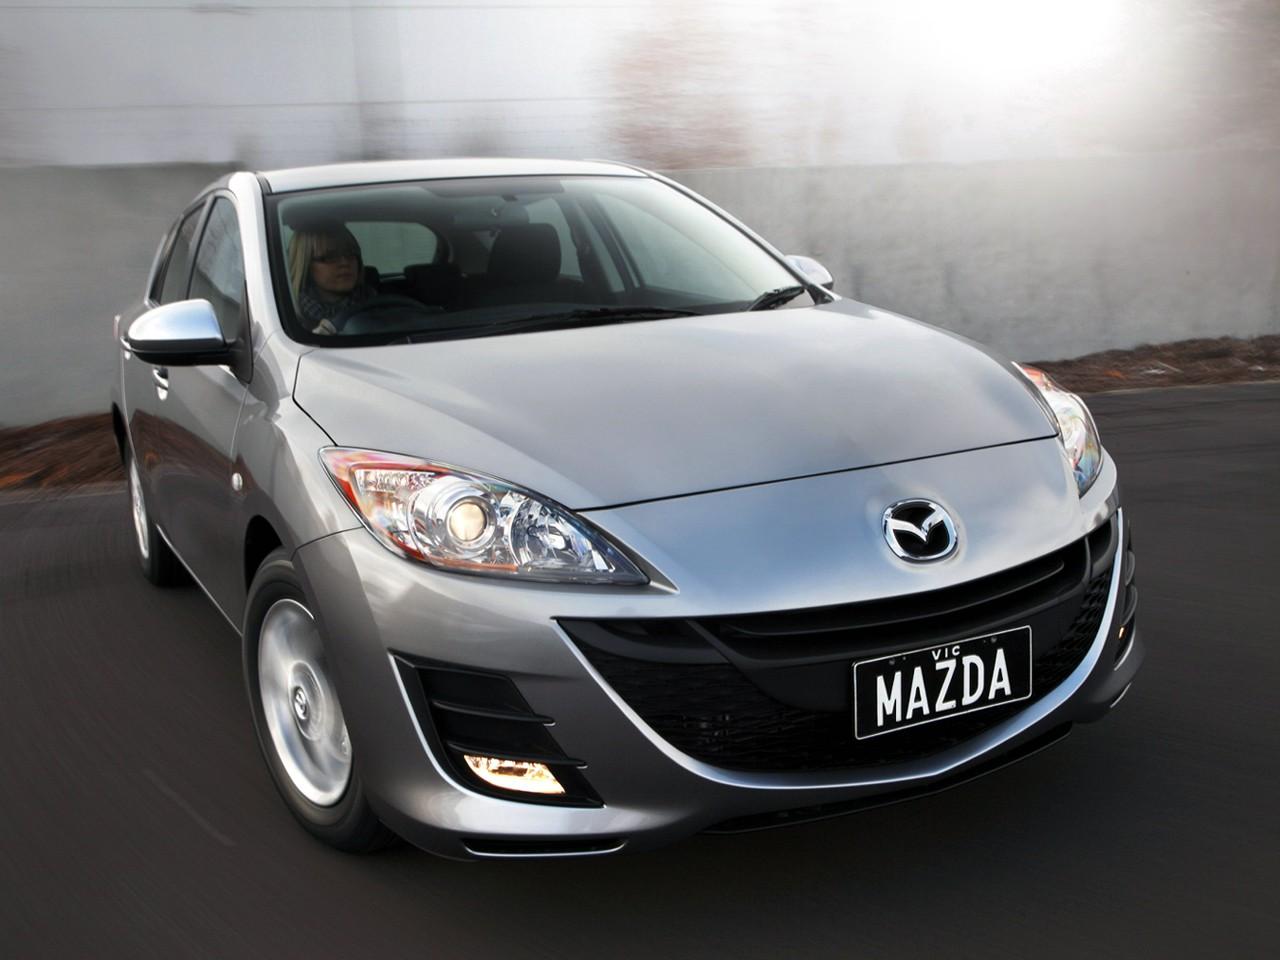 2012 mazda 3 hatchback photo car reviews 2013 car reviews and html autos weblog. Black Bedroom Furniture Sets. Home Design Ideas